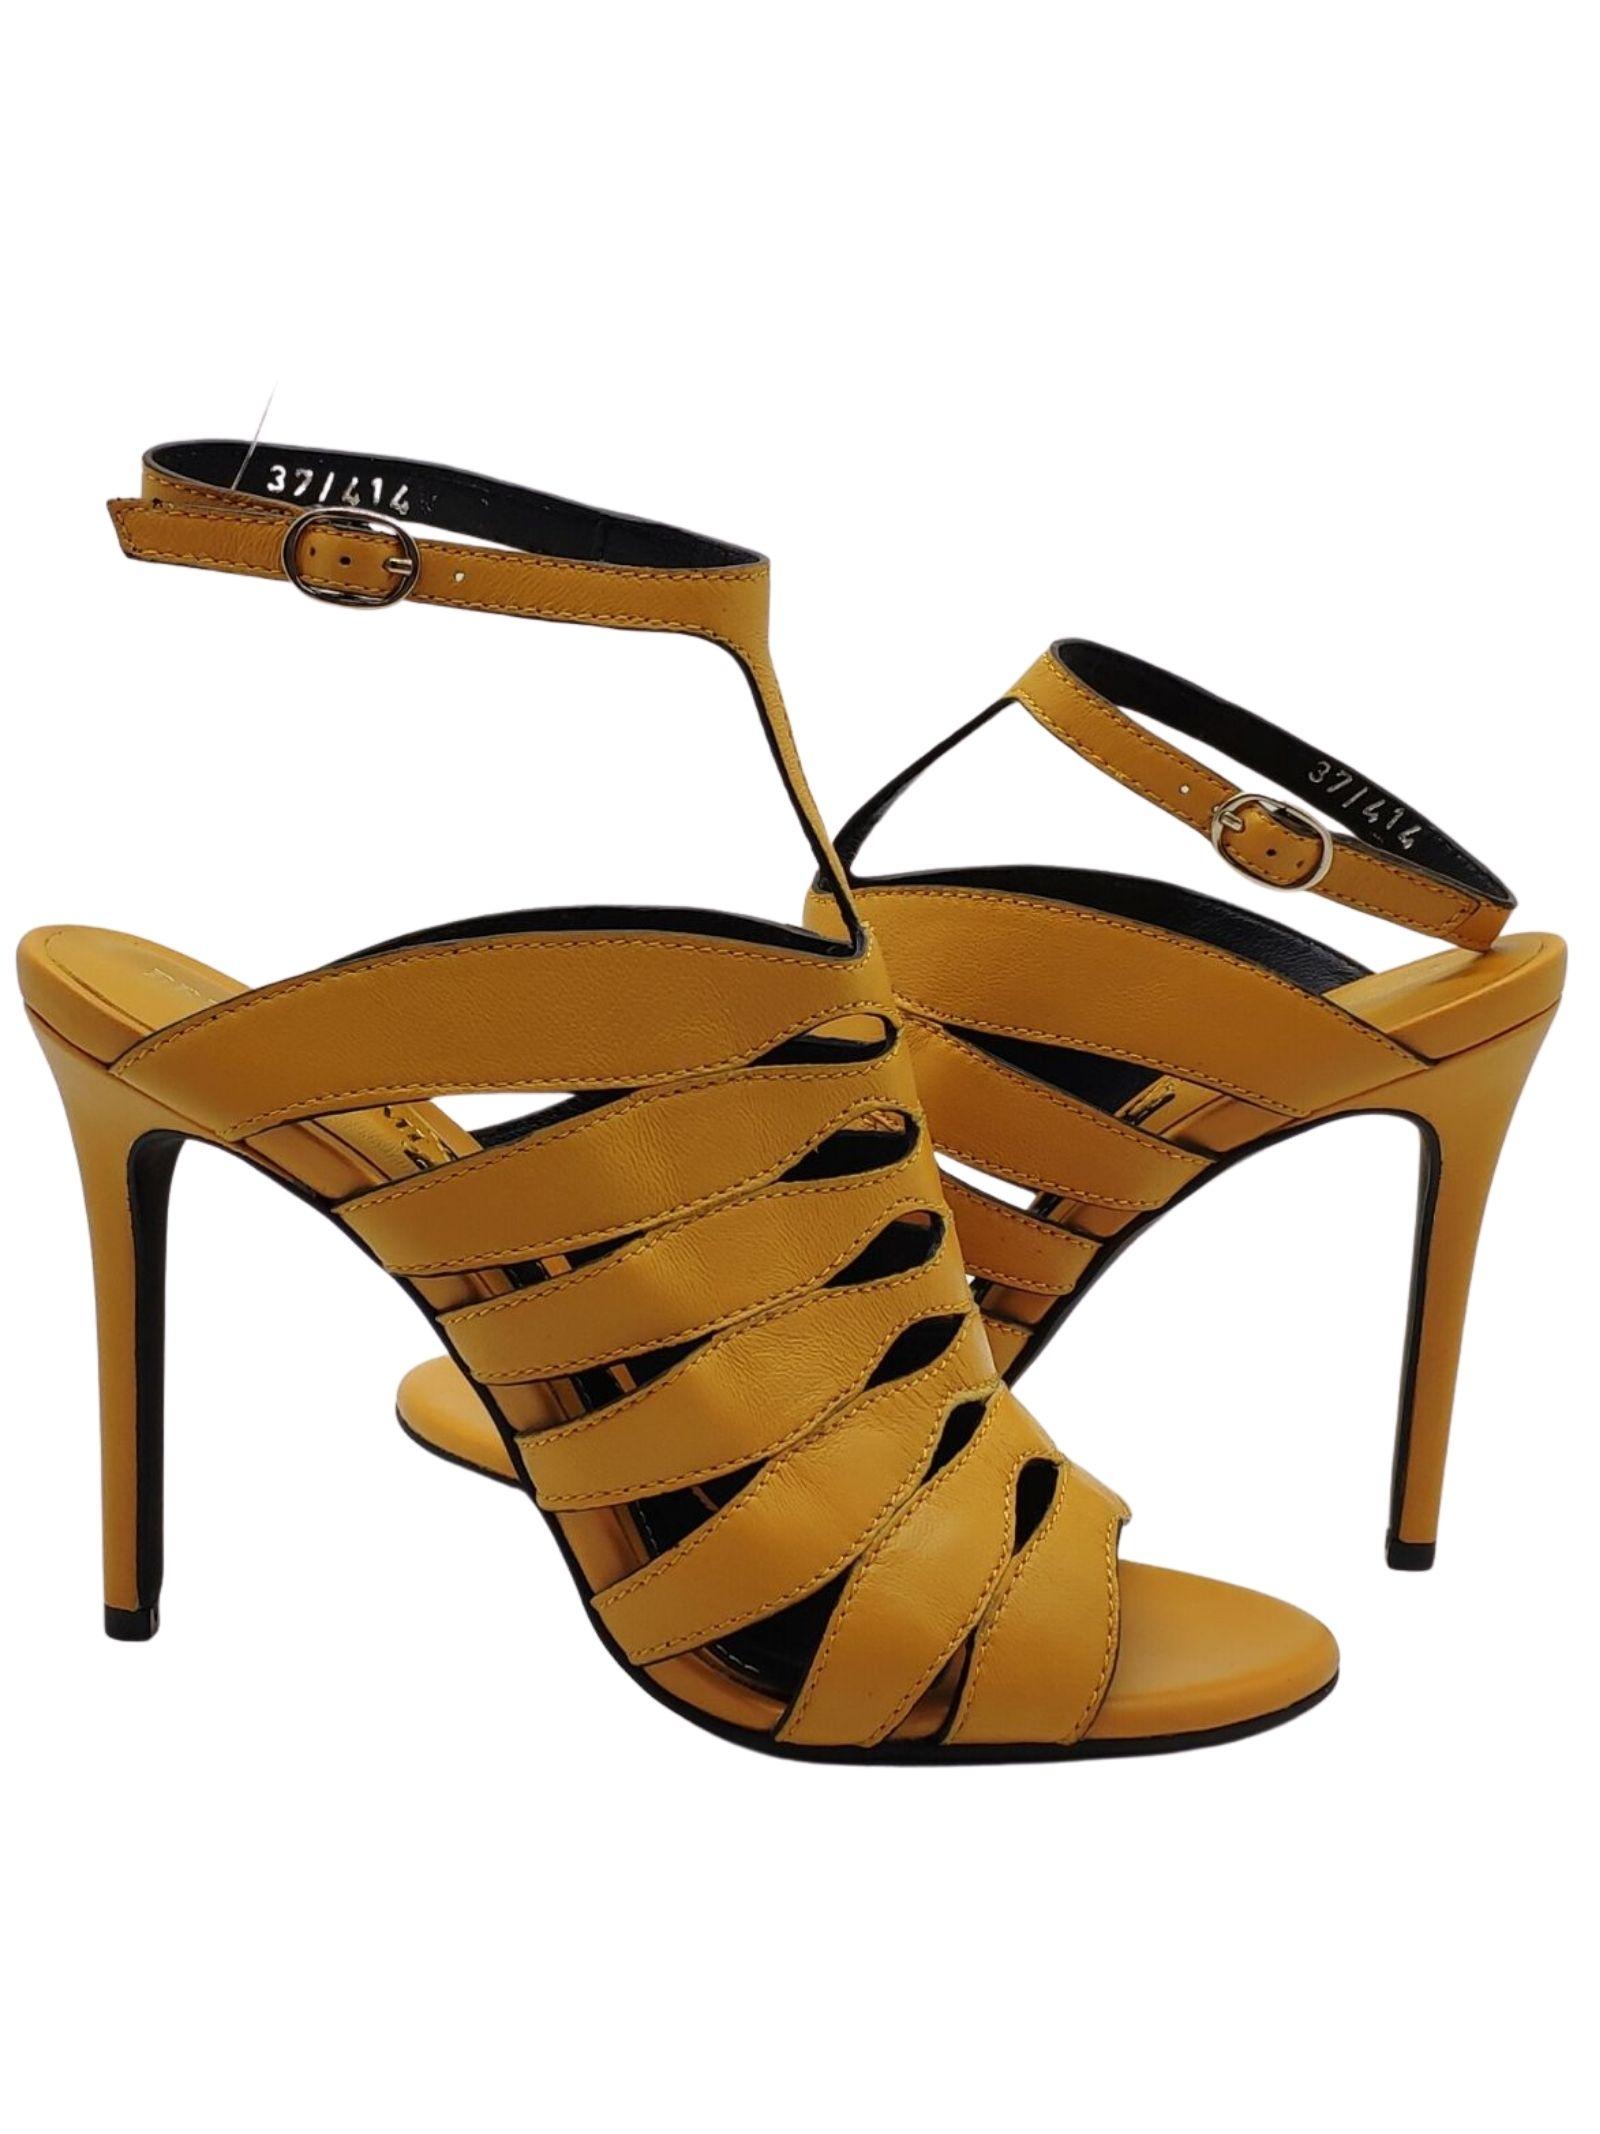 Women's High Heel Sandals Bruno Premi | Sandals | BZ4204XSENAPE